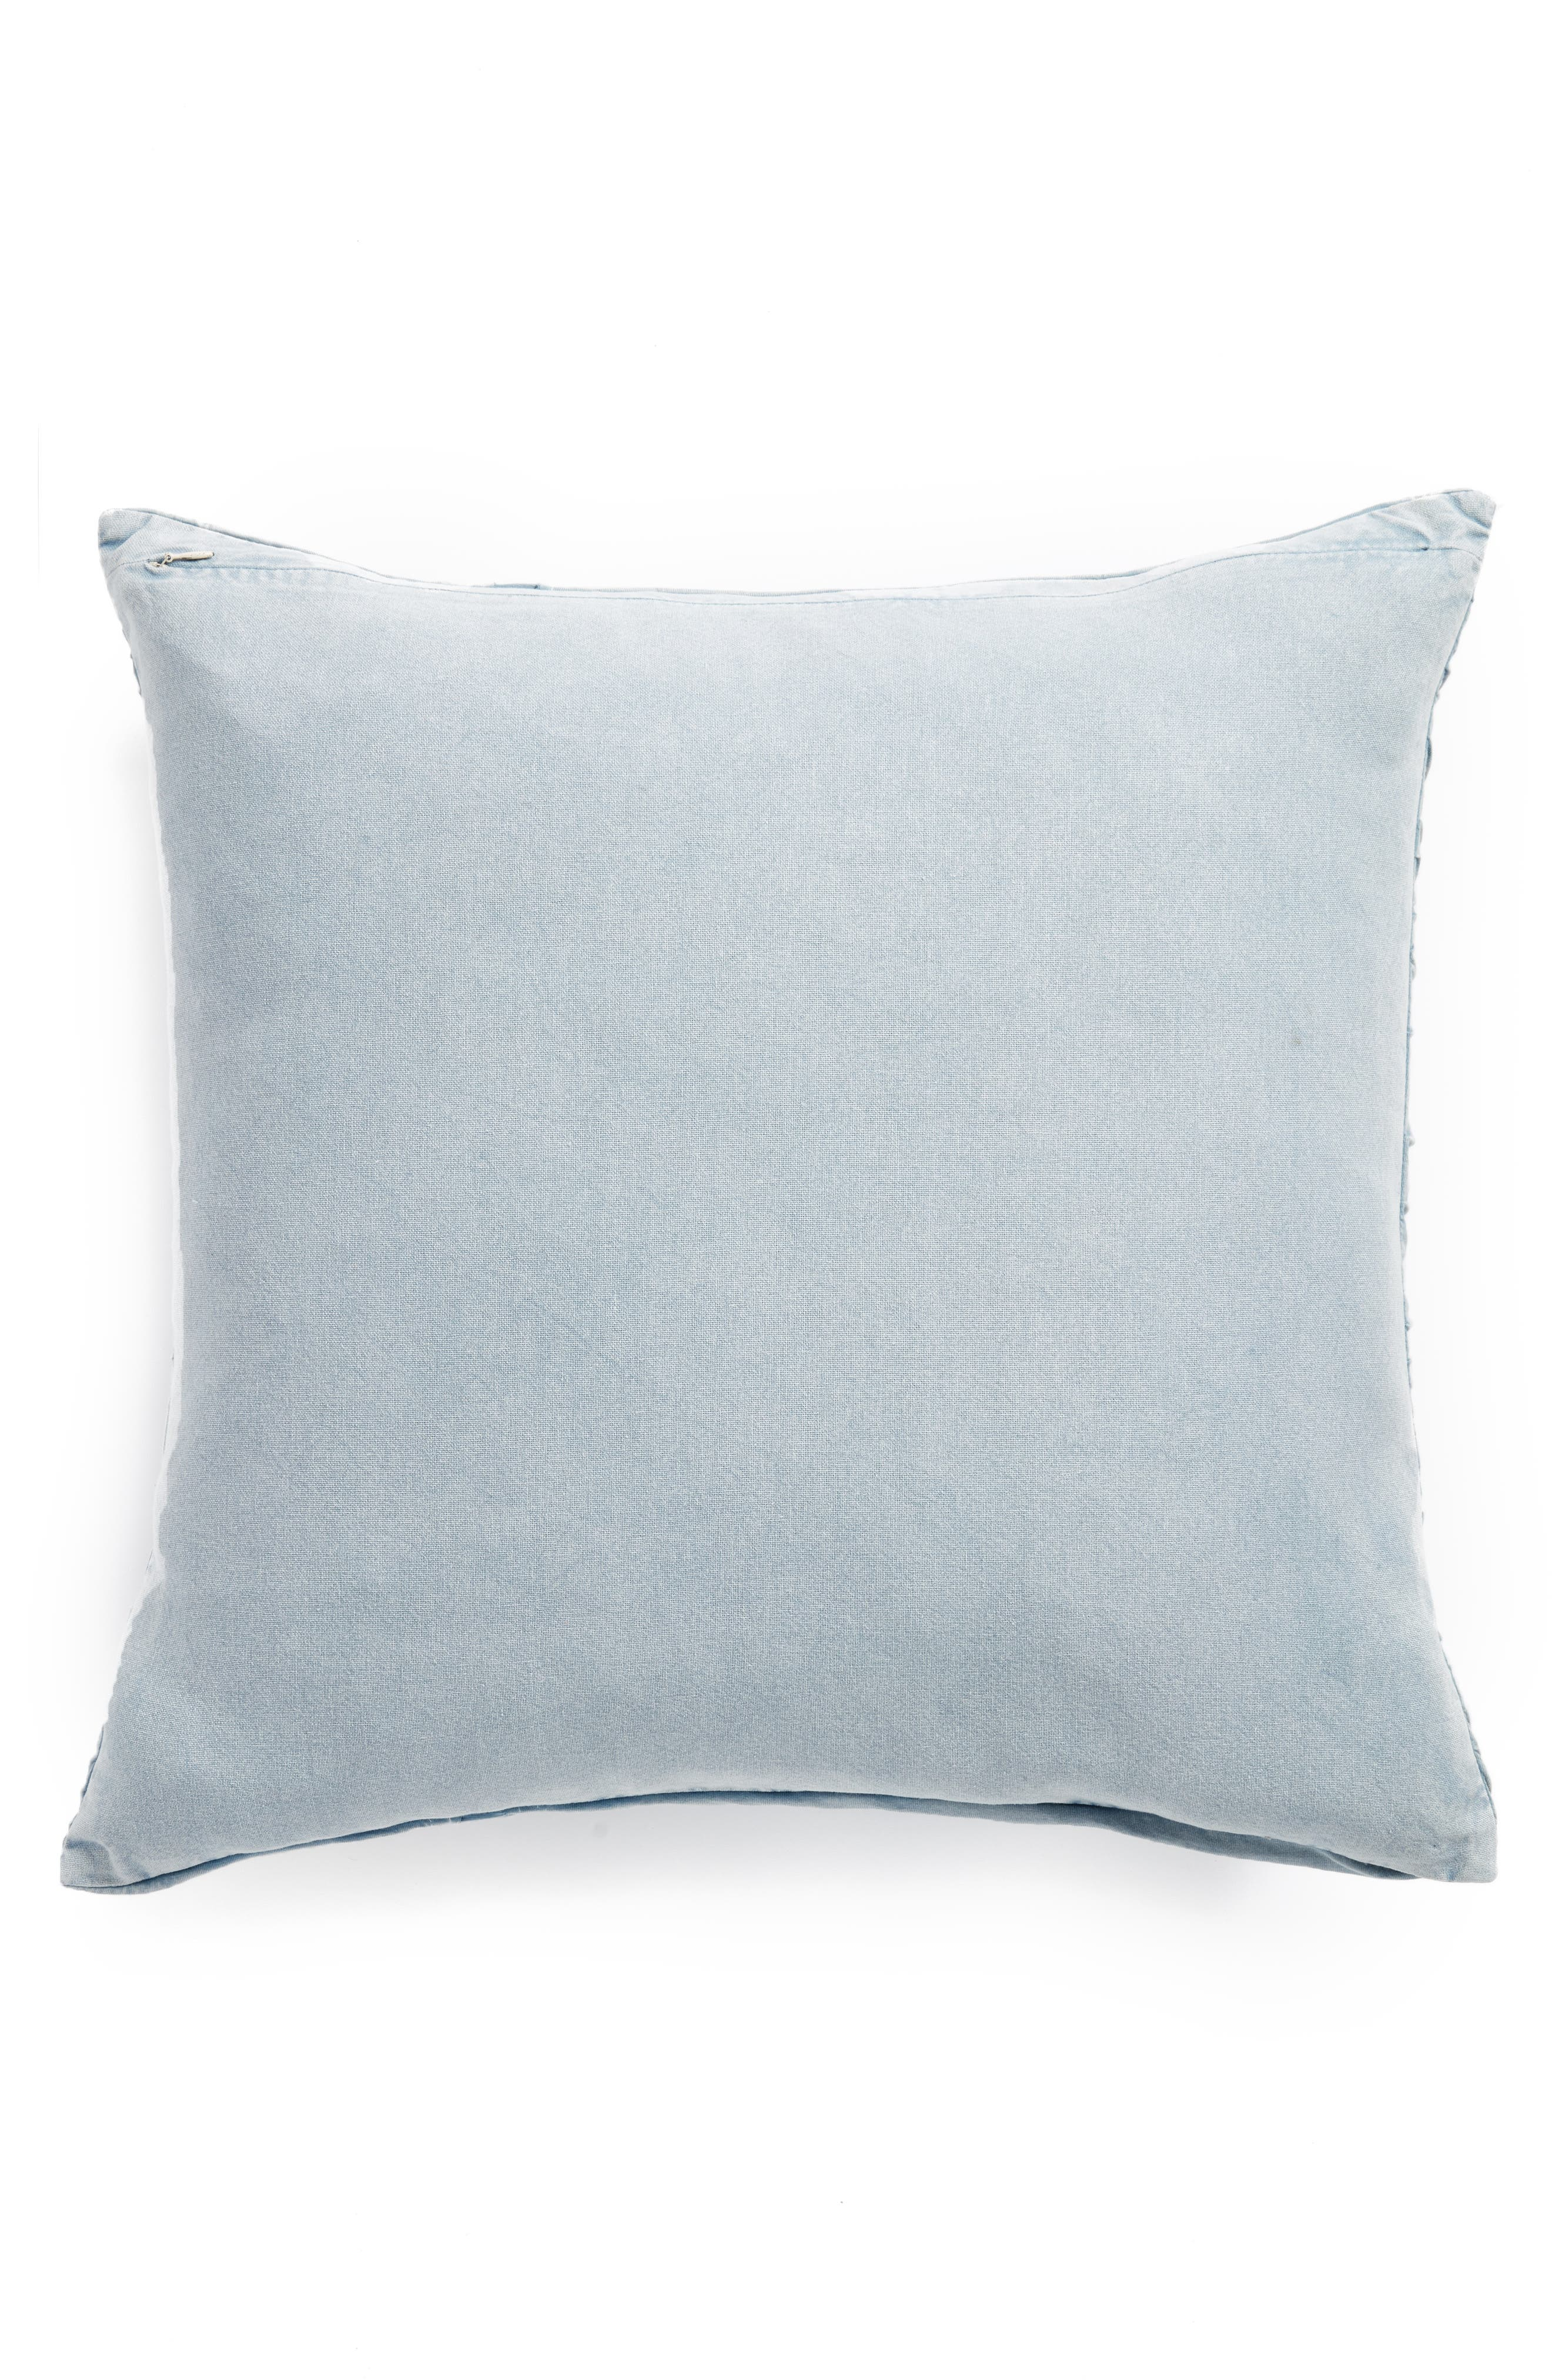 Stonewash Jersey Accent Pillow,                             Alternate thumbnail 2, color,                             400